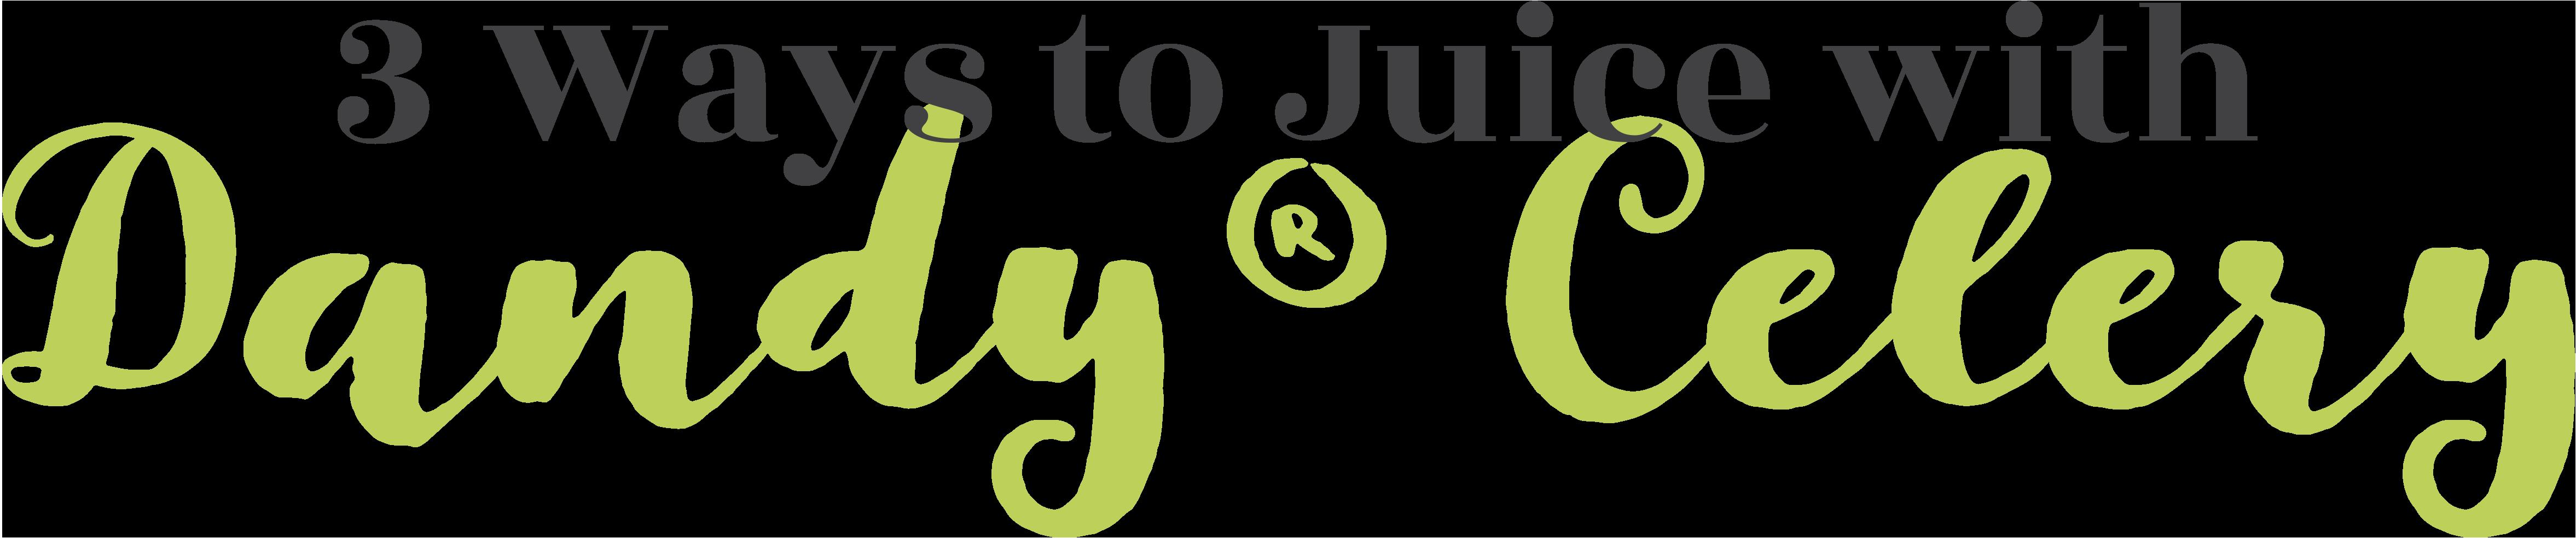 Three ways to juice with Dandy celery